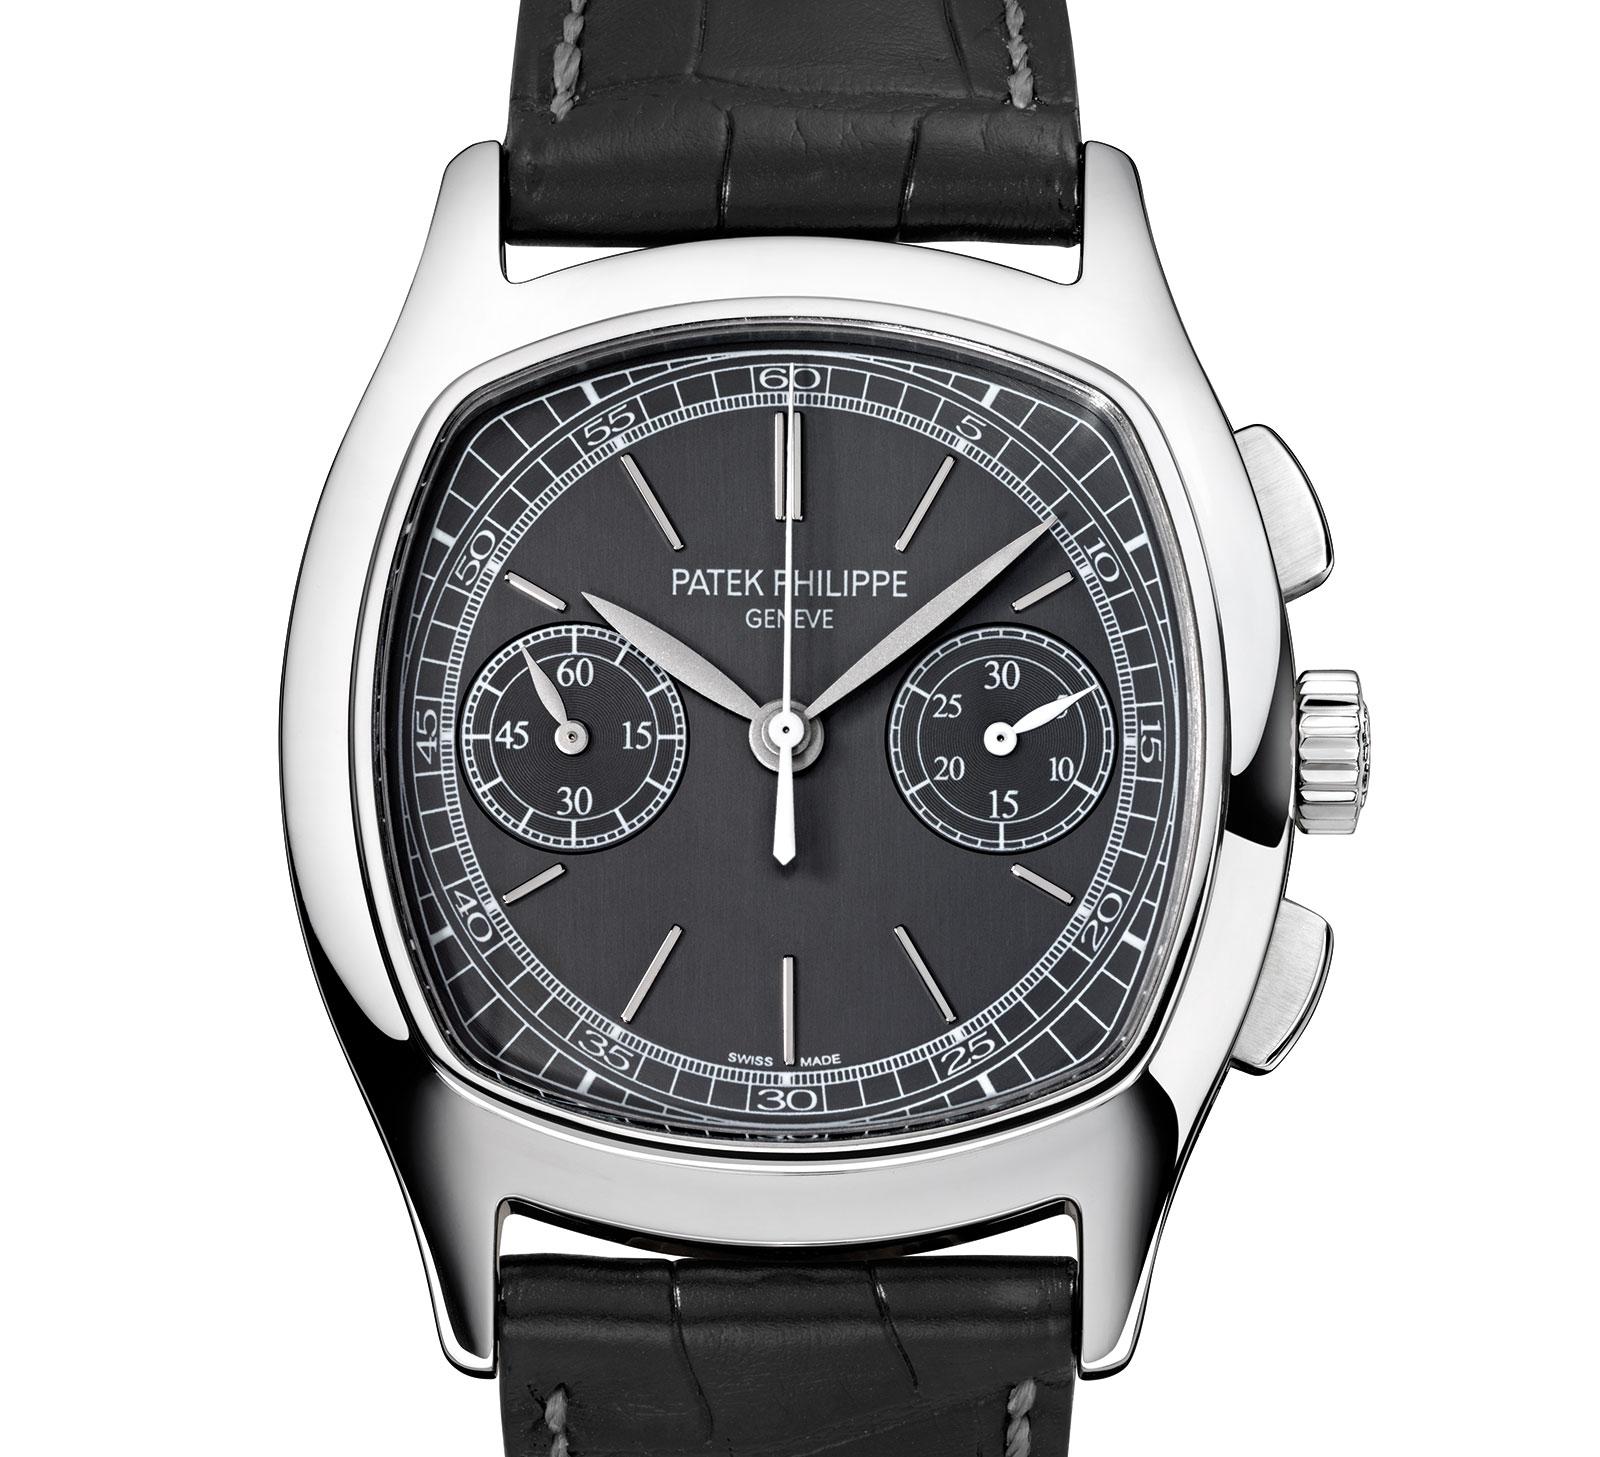 Patek Philippe steel chronograph 3670A-001